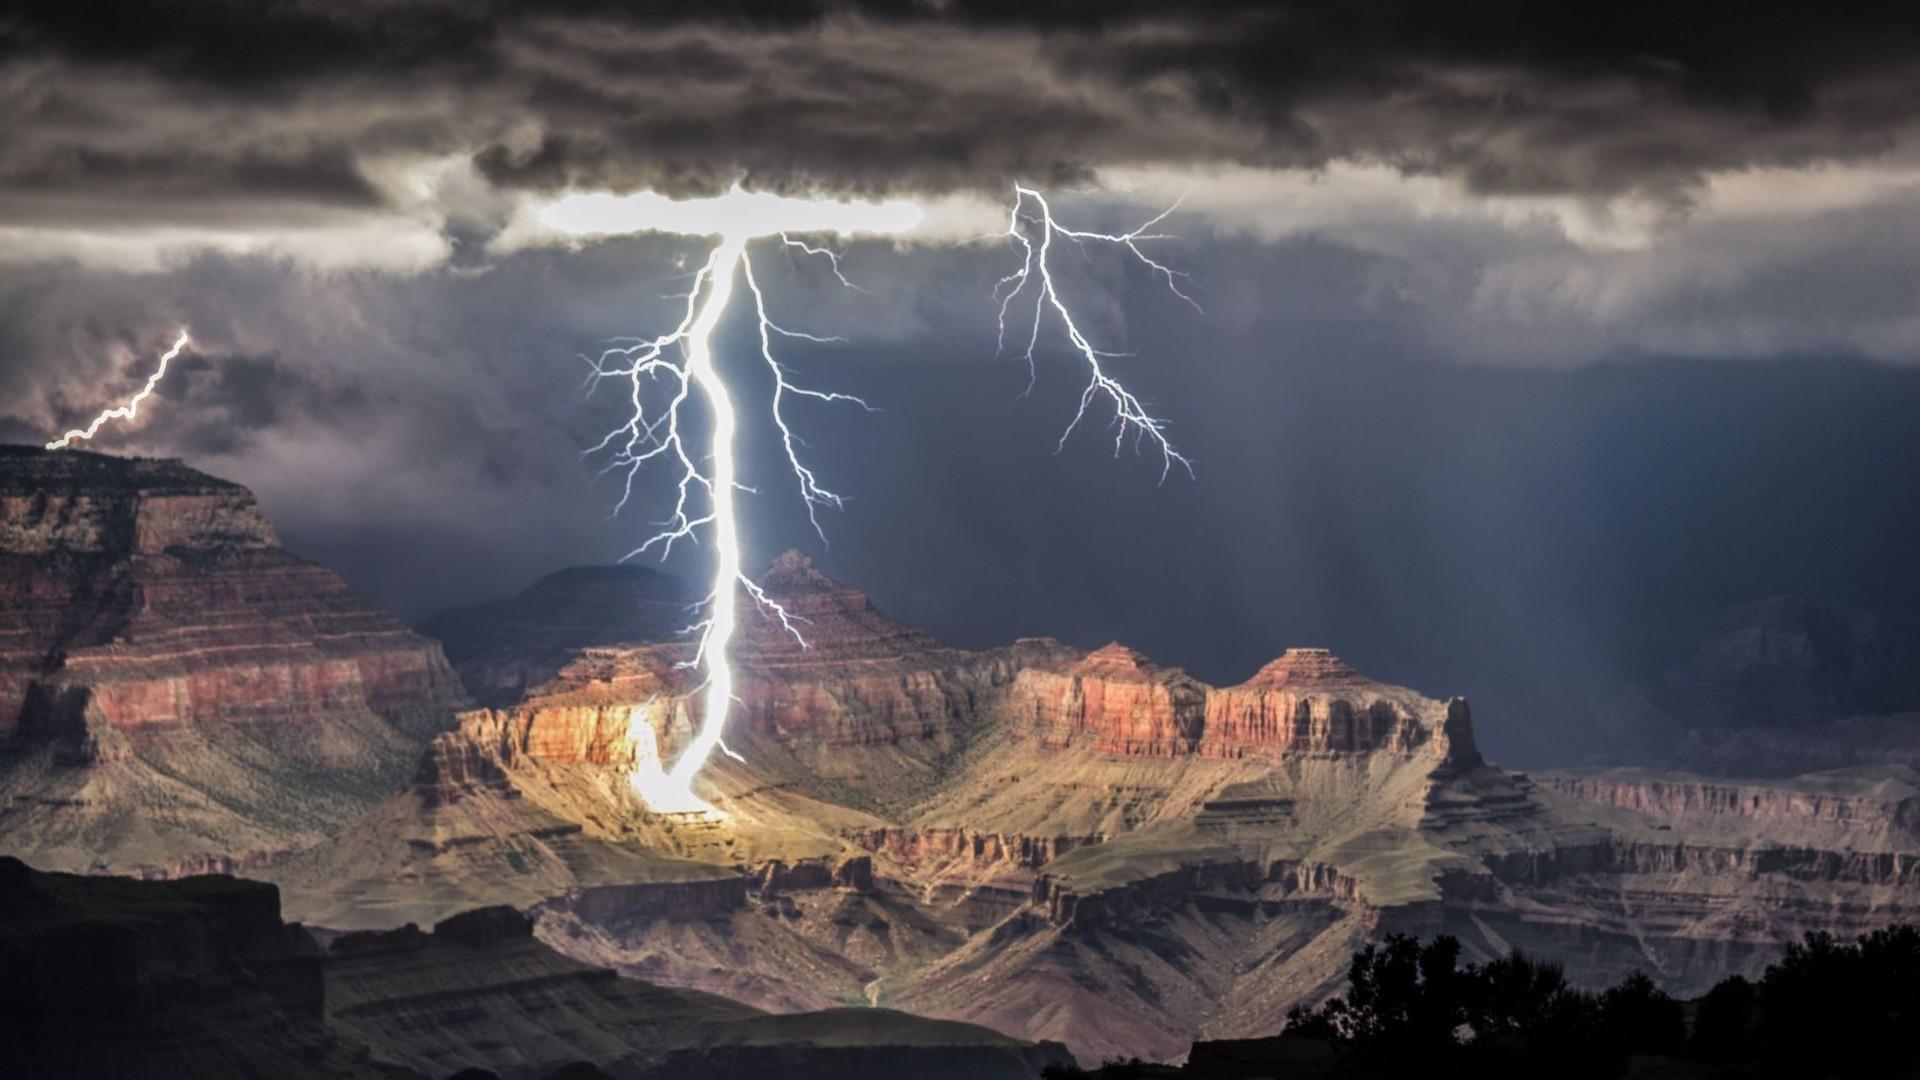 Res: 1920x1080, The Grand Canyon - lightning strike at night [] (i.imgur.com)